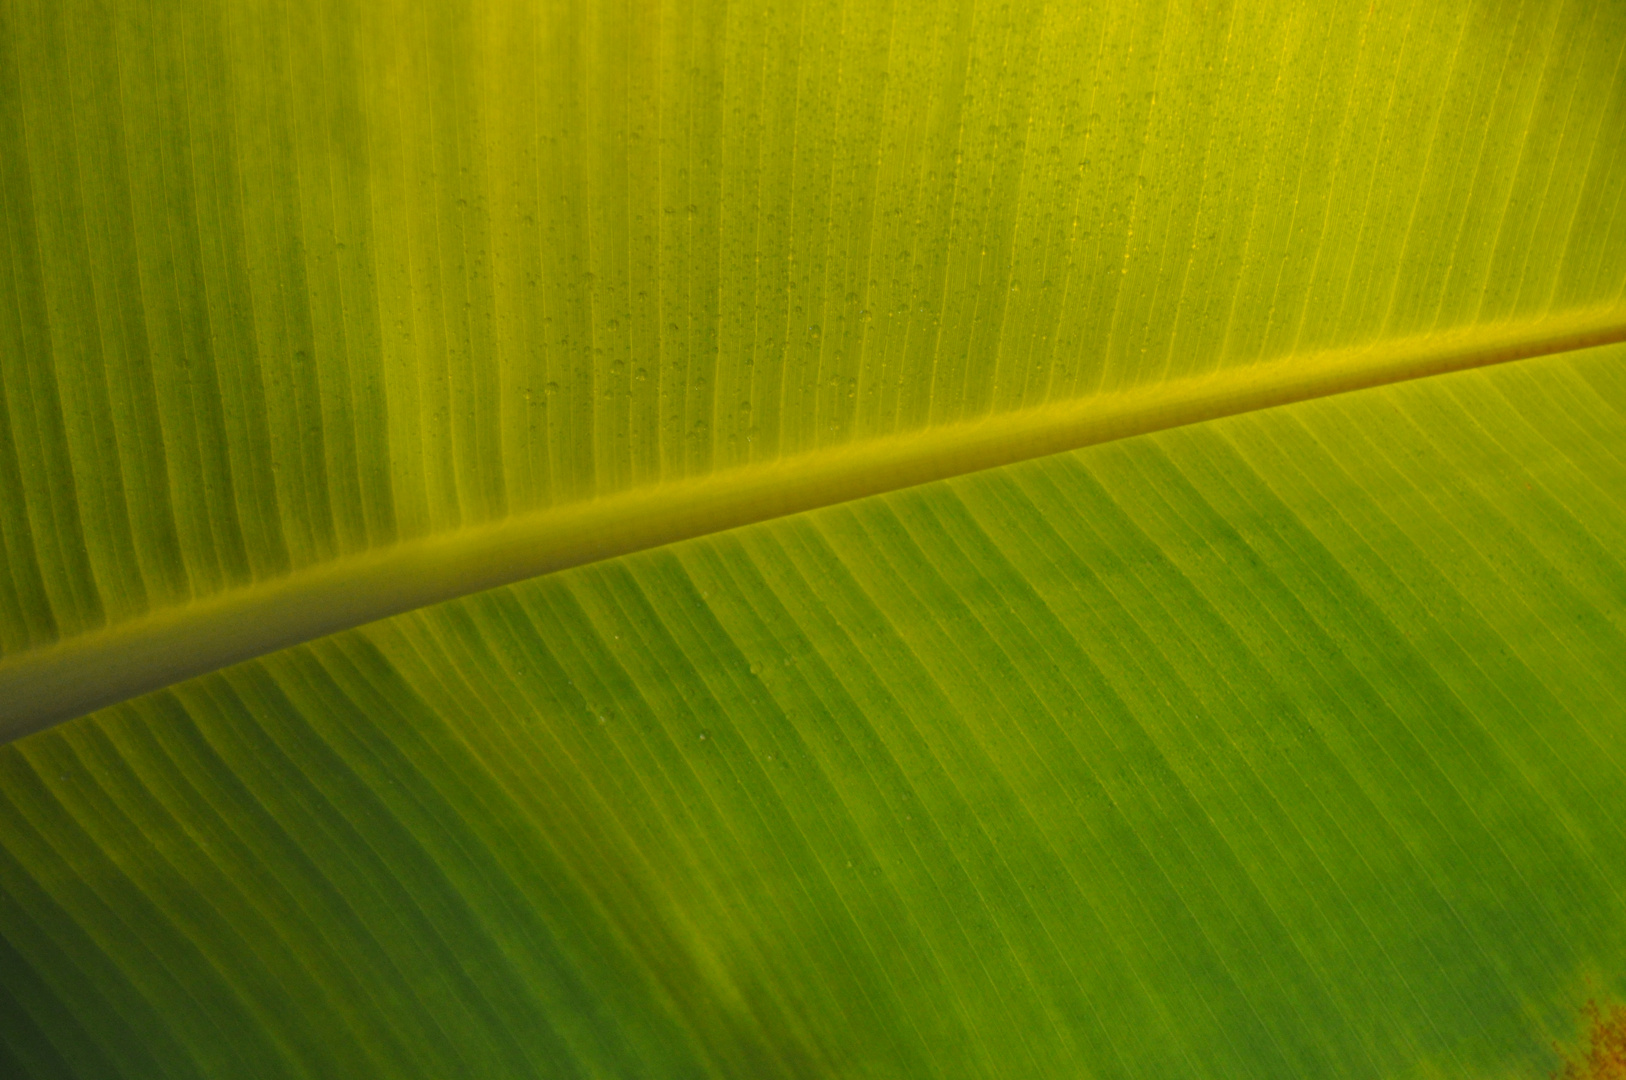 The Wave *Bananenblatt*